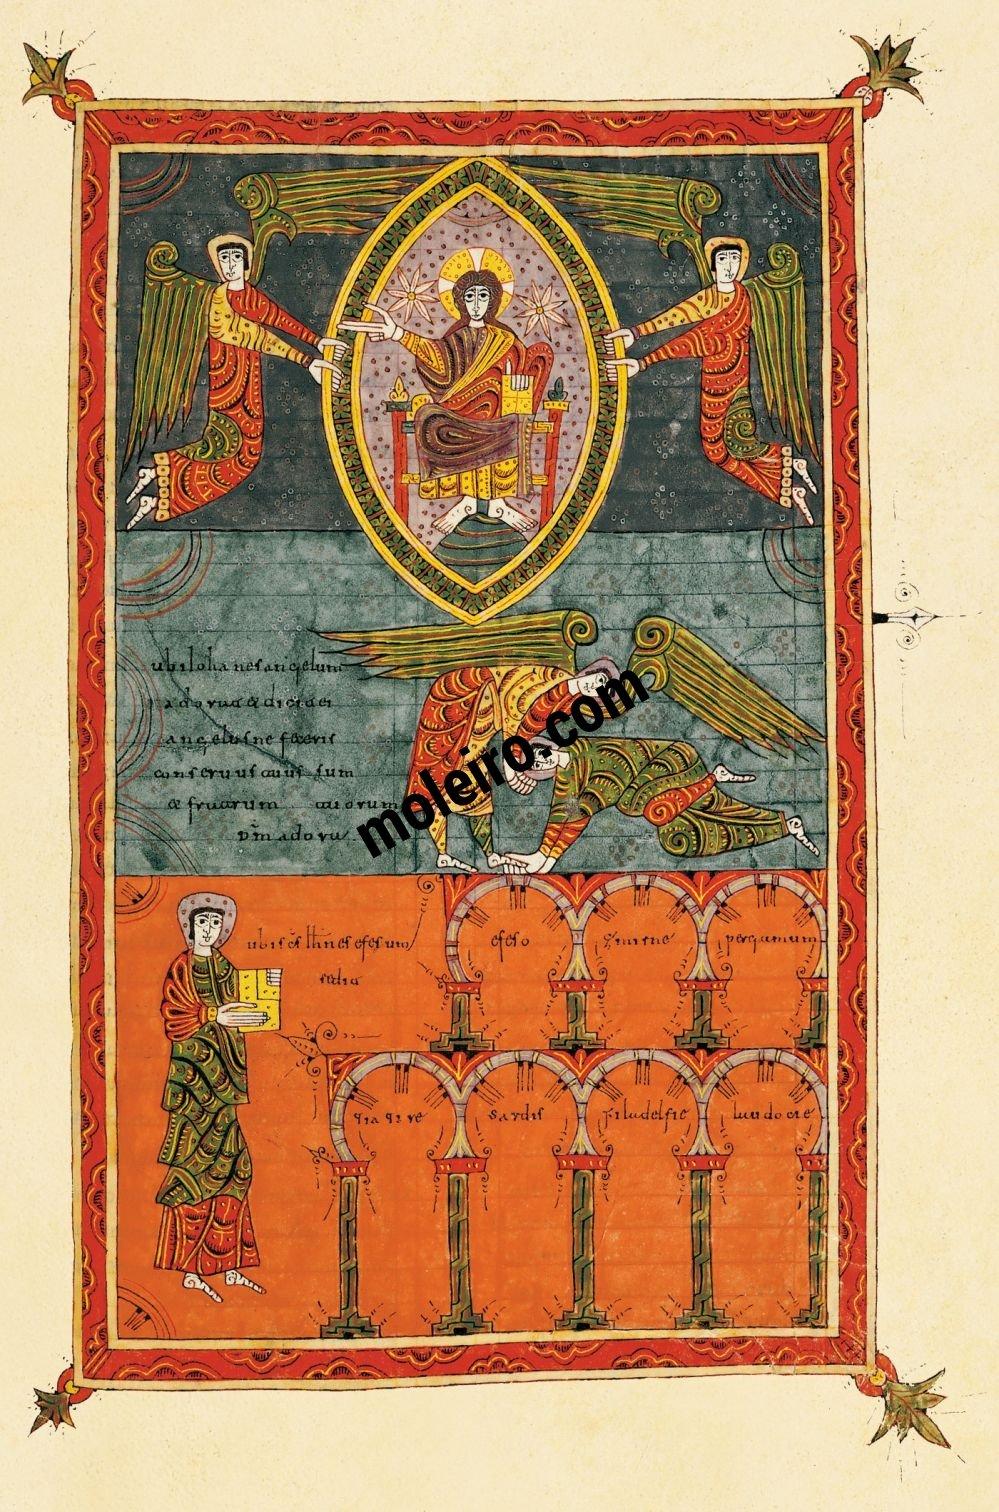 Silos Beatus f. 216r, John prostrates himself at the angel's feet